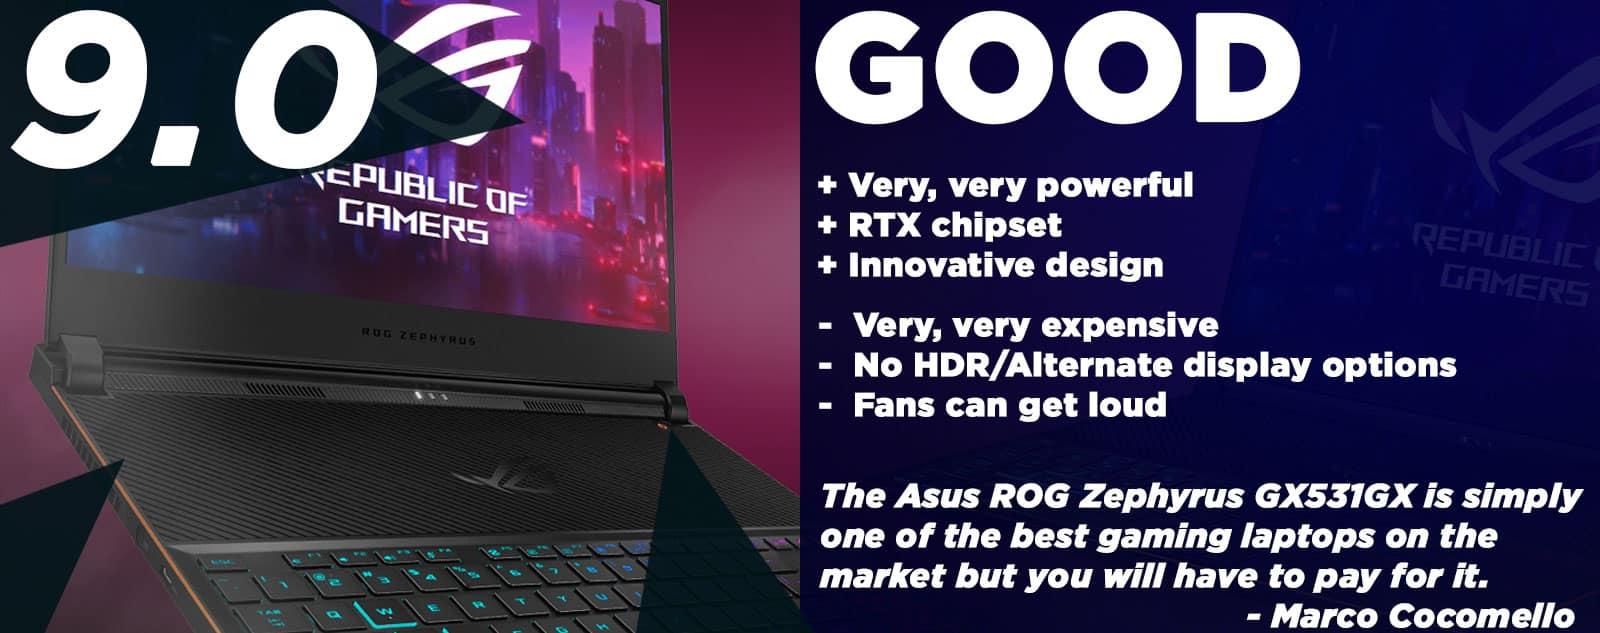 Asus ROG Zephyrus GX531GX